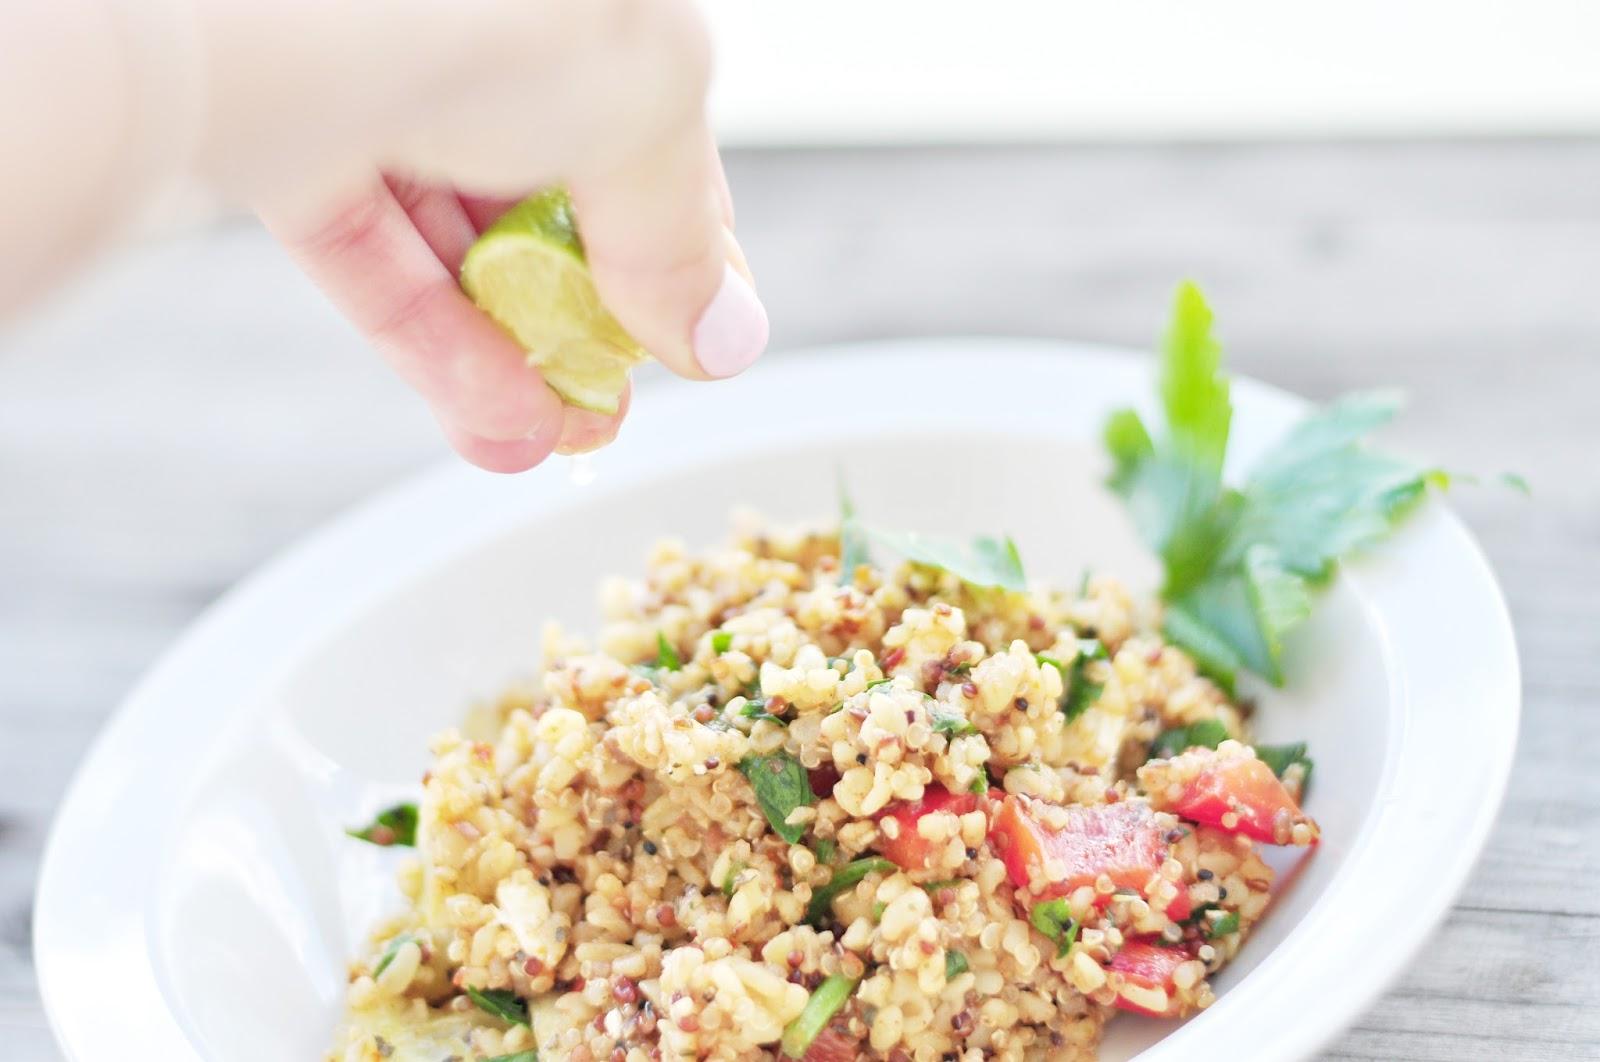 easy salad with bulgur and quinoa groats